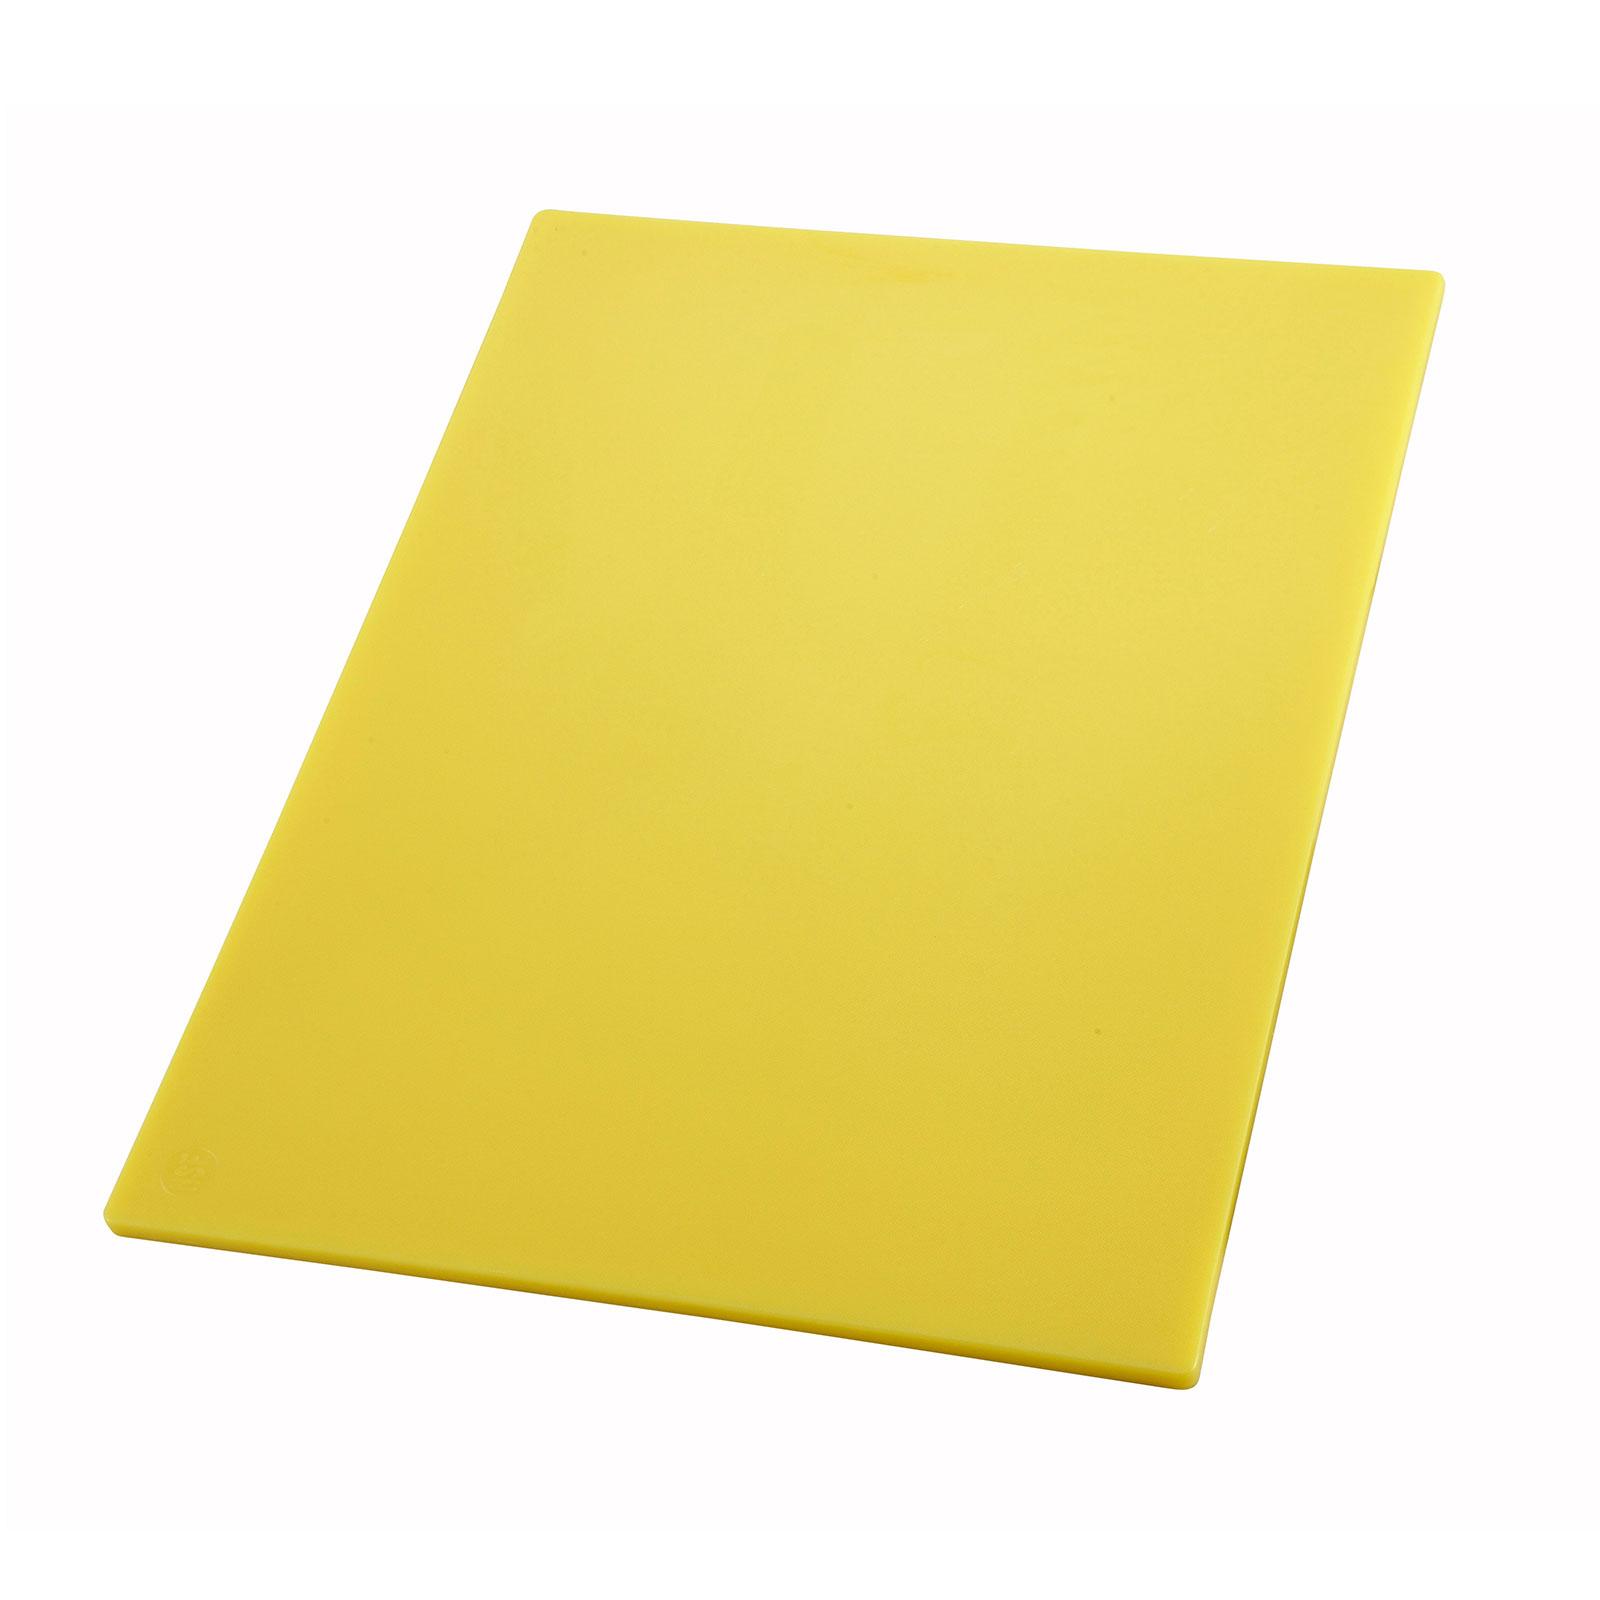 1700-110 Winco CBYL-1824 cutting board, plastic